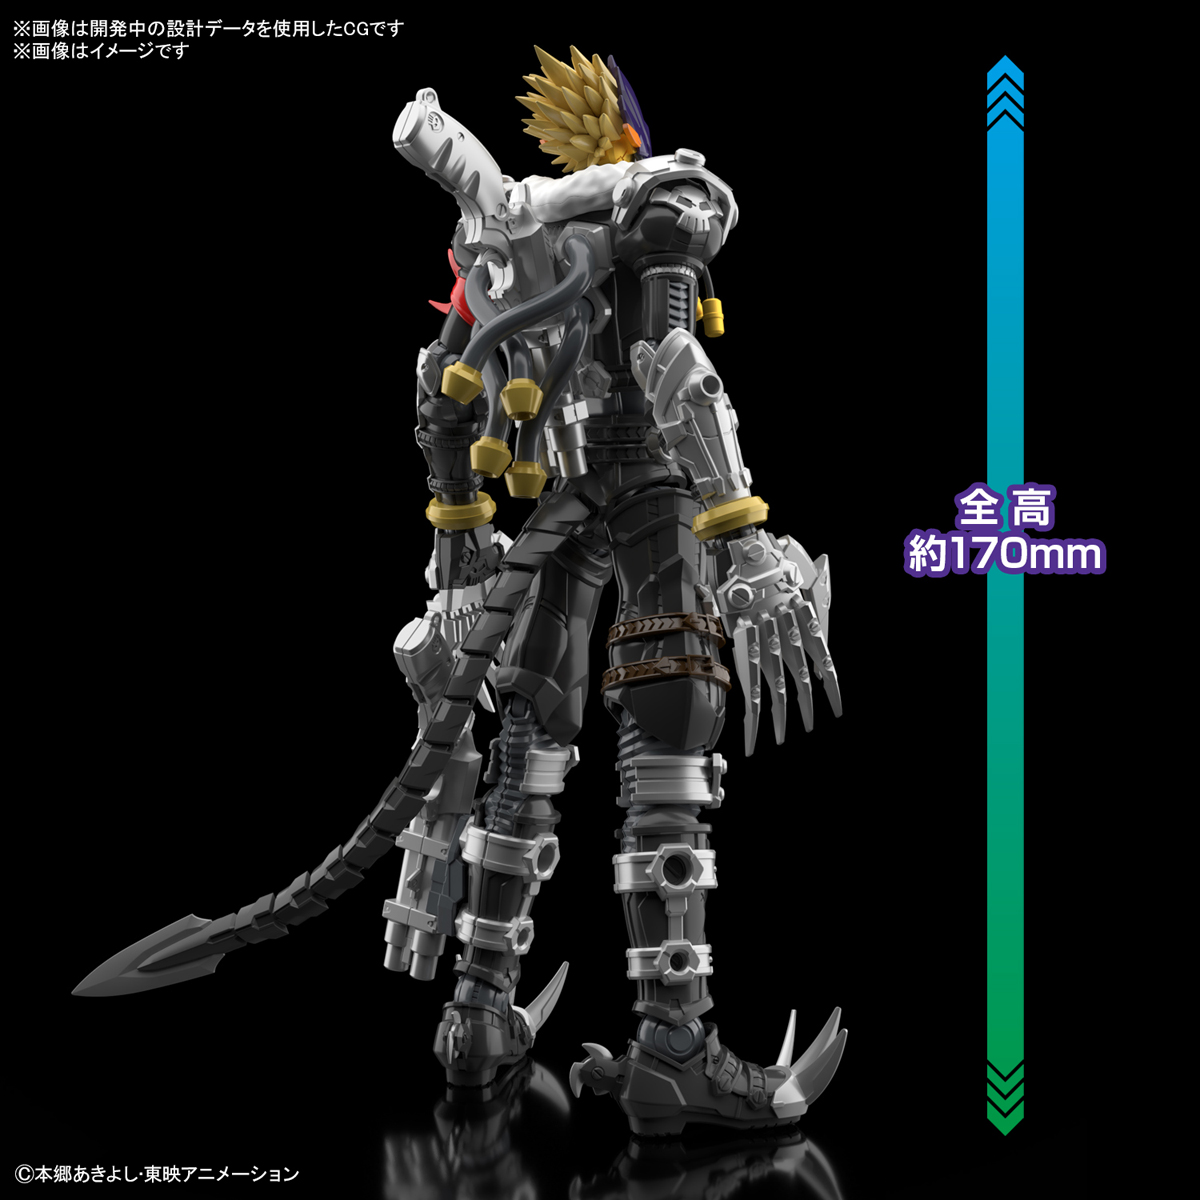 Figure-rise Standard Amplified『ベルゼブモン』デジモンテイマーズ プラモデル-002